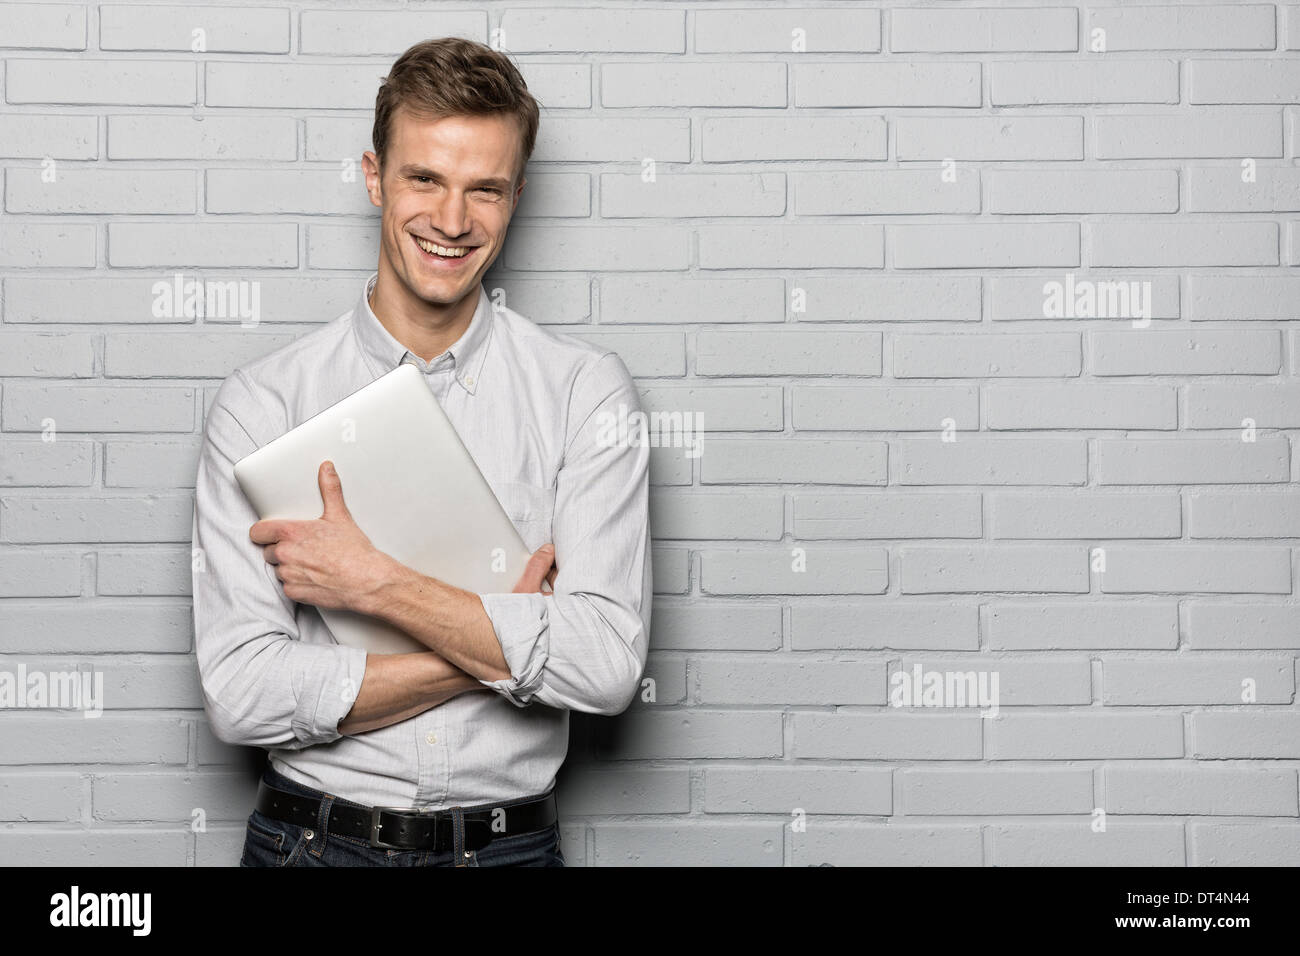 Male portrait smiling computer studio brick looking camera - Stock Image